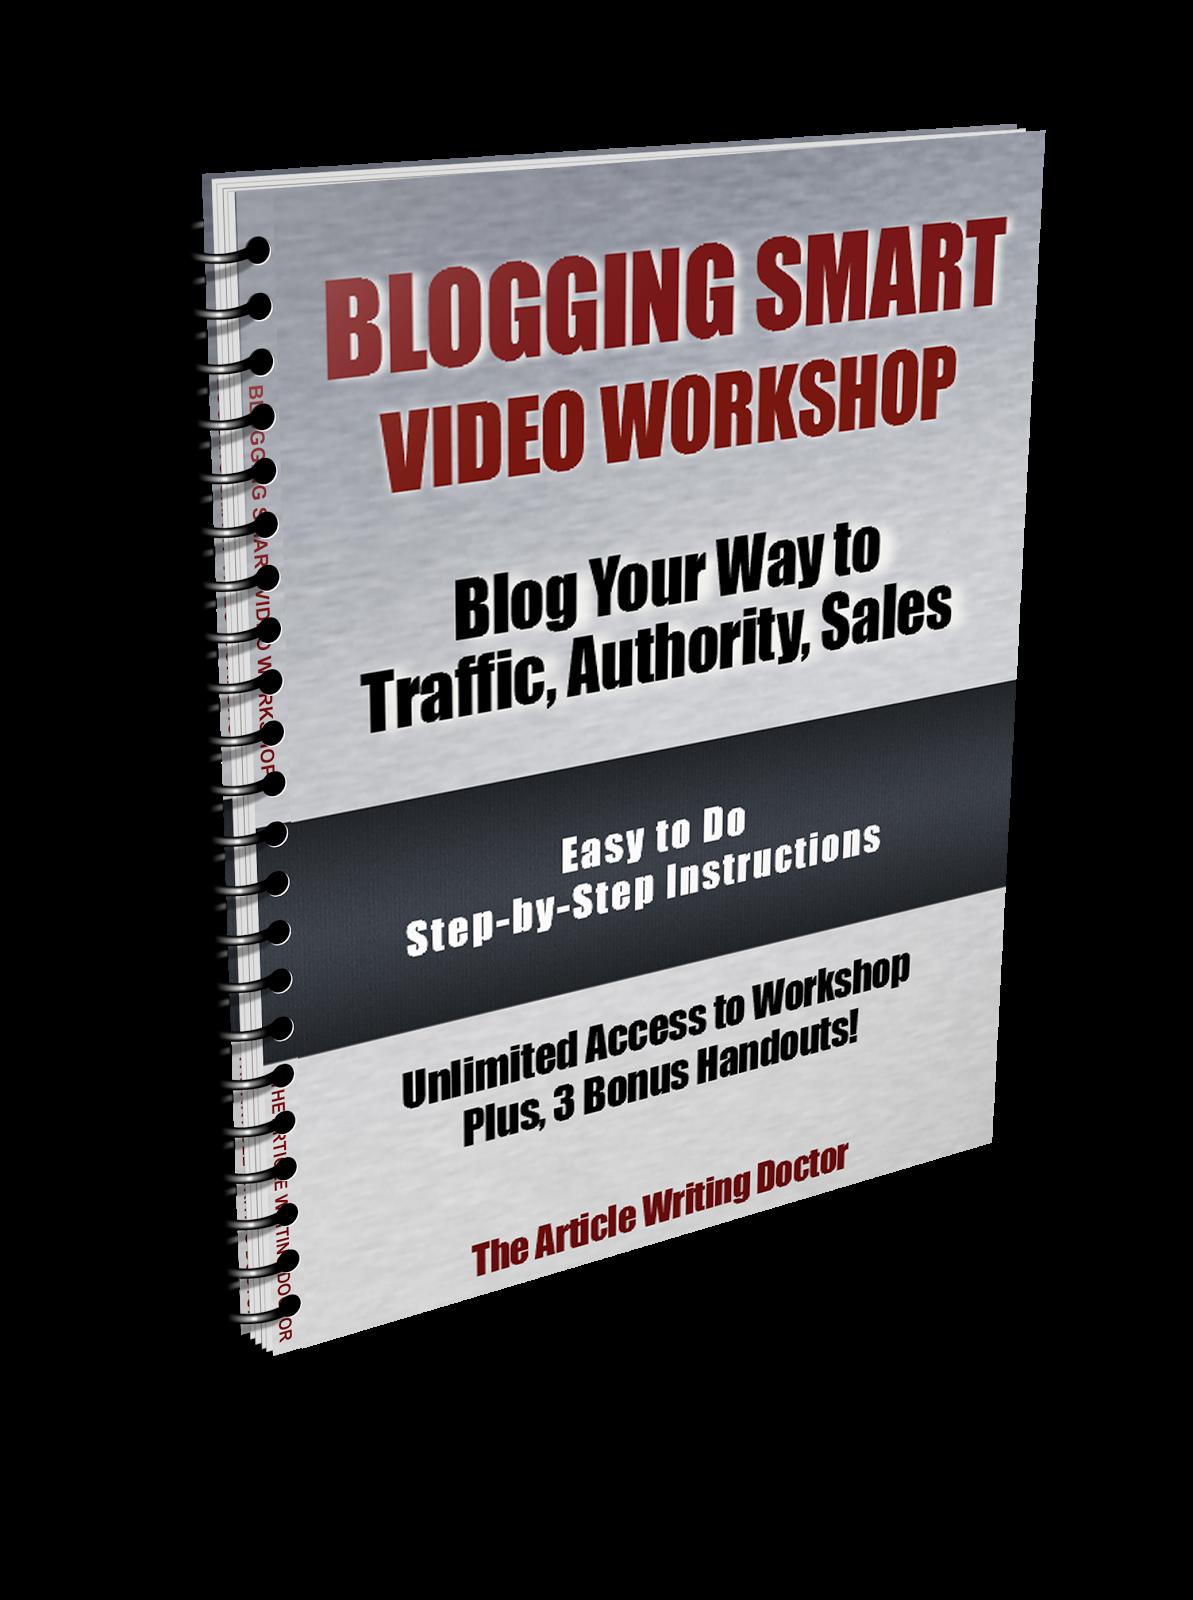 Blogging Smart